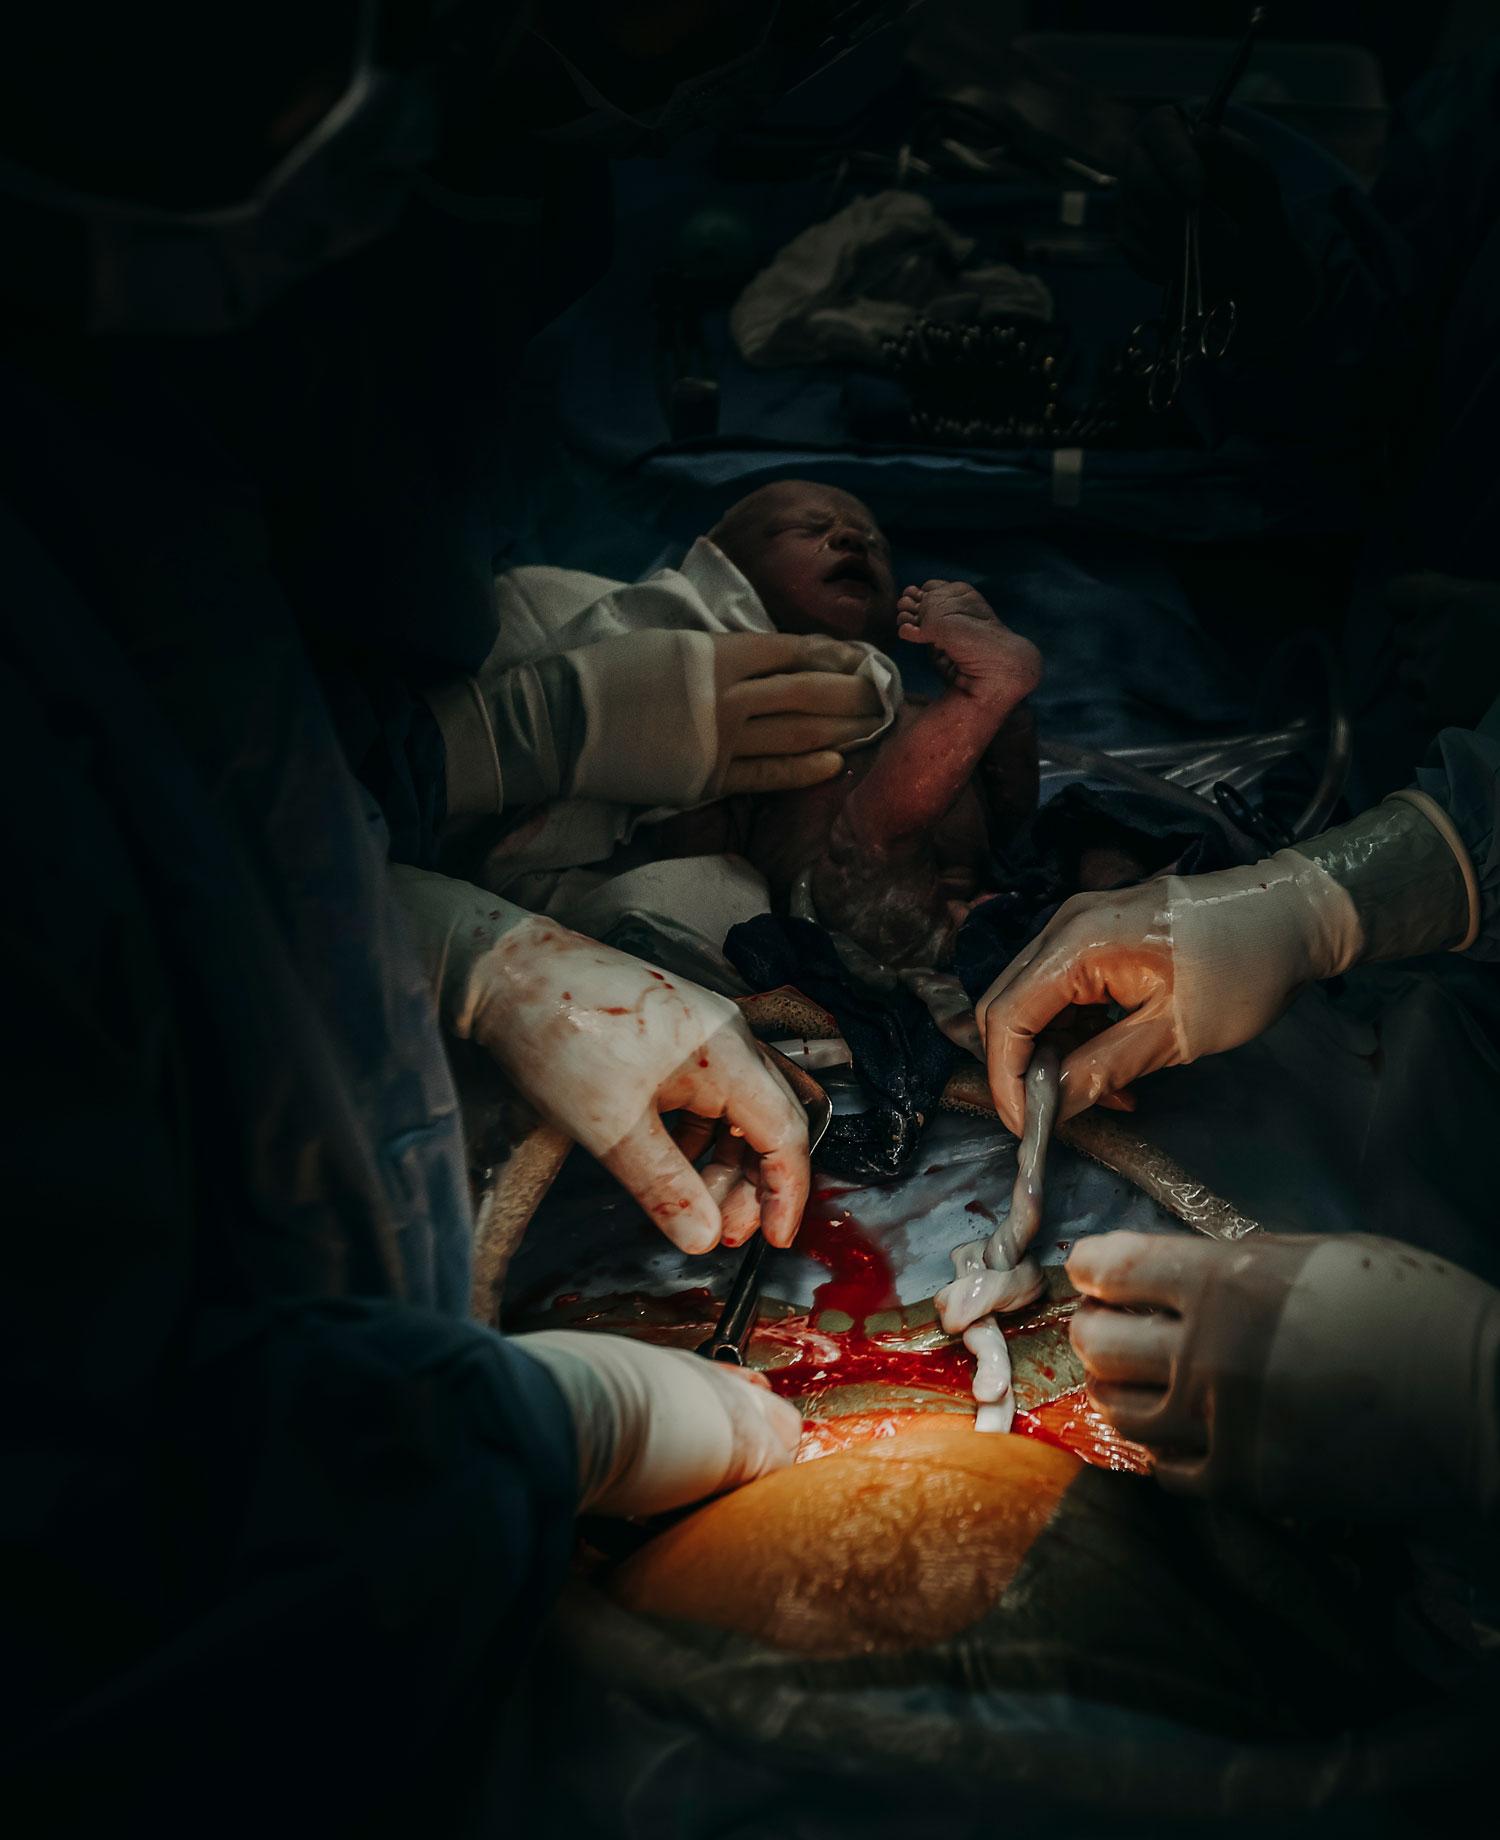 Hawaii-Birth-Photographer-Twins-Cesarean-11.jpg